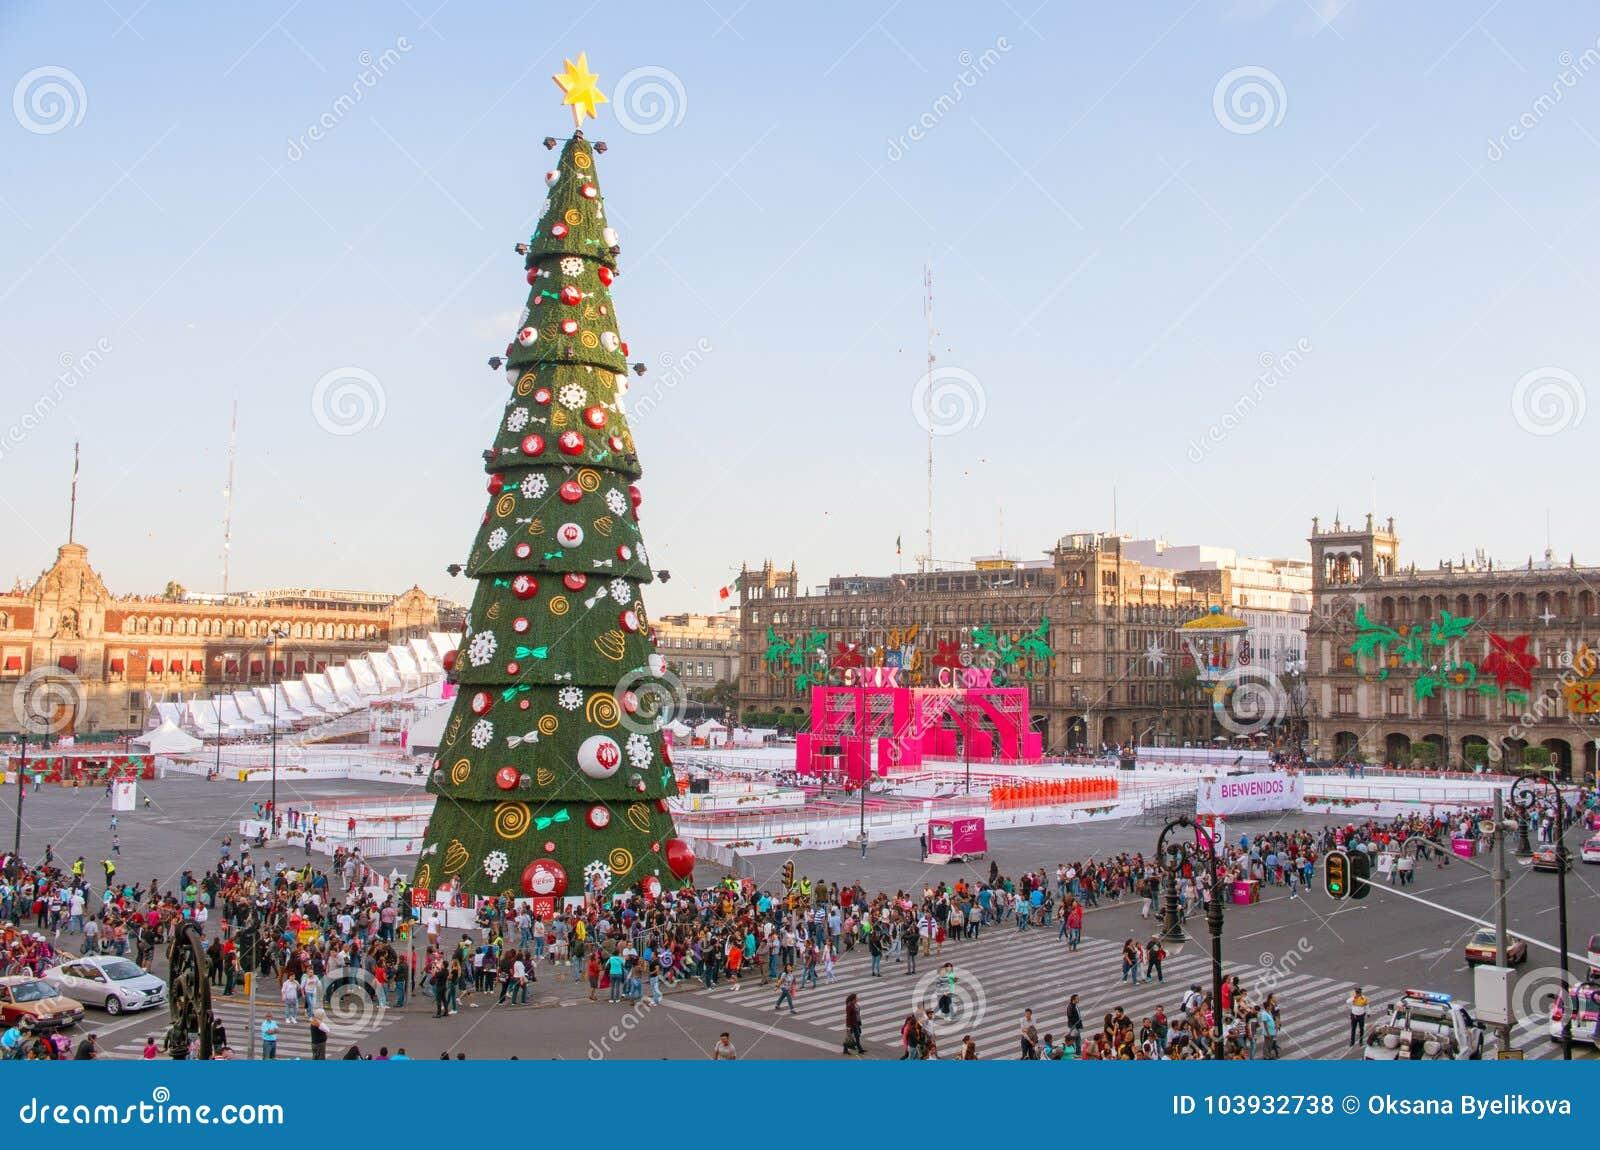 Christmas Ice Skating Rink Decoration.Christmas Tree And Ice Skating Rink On Zocalo Mexico City